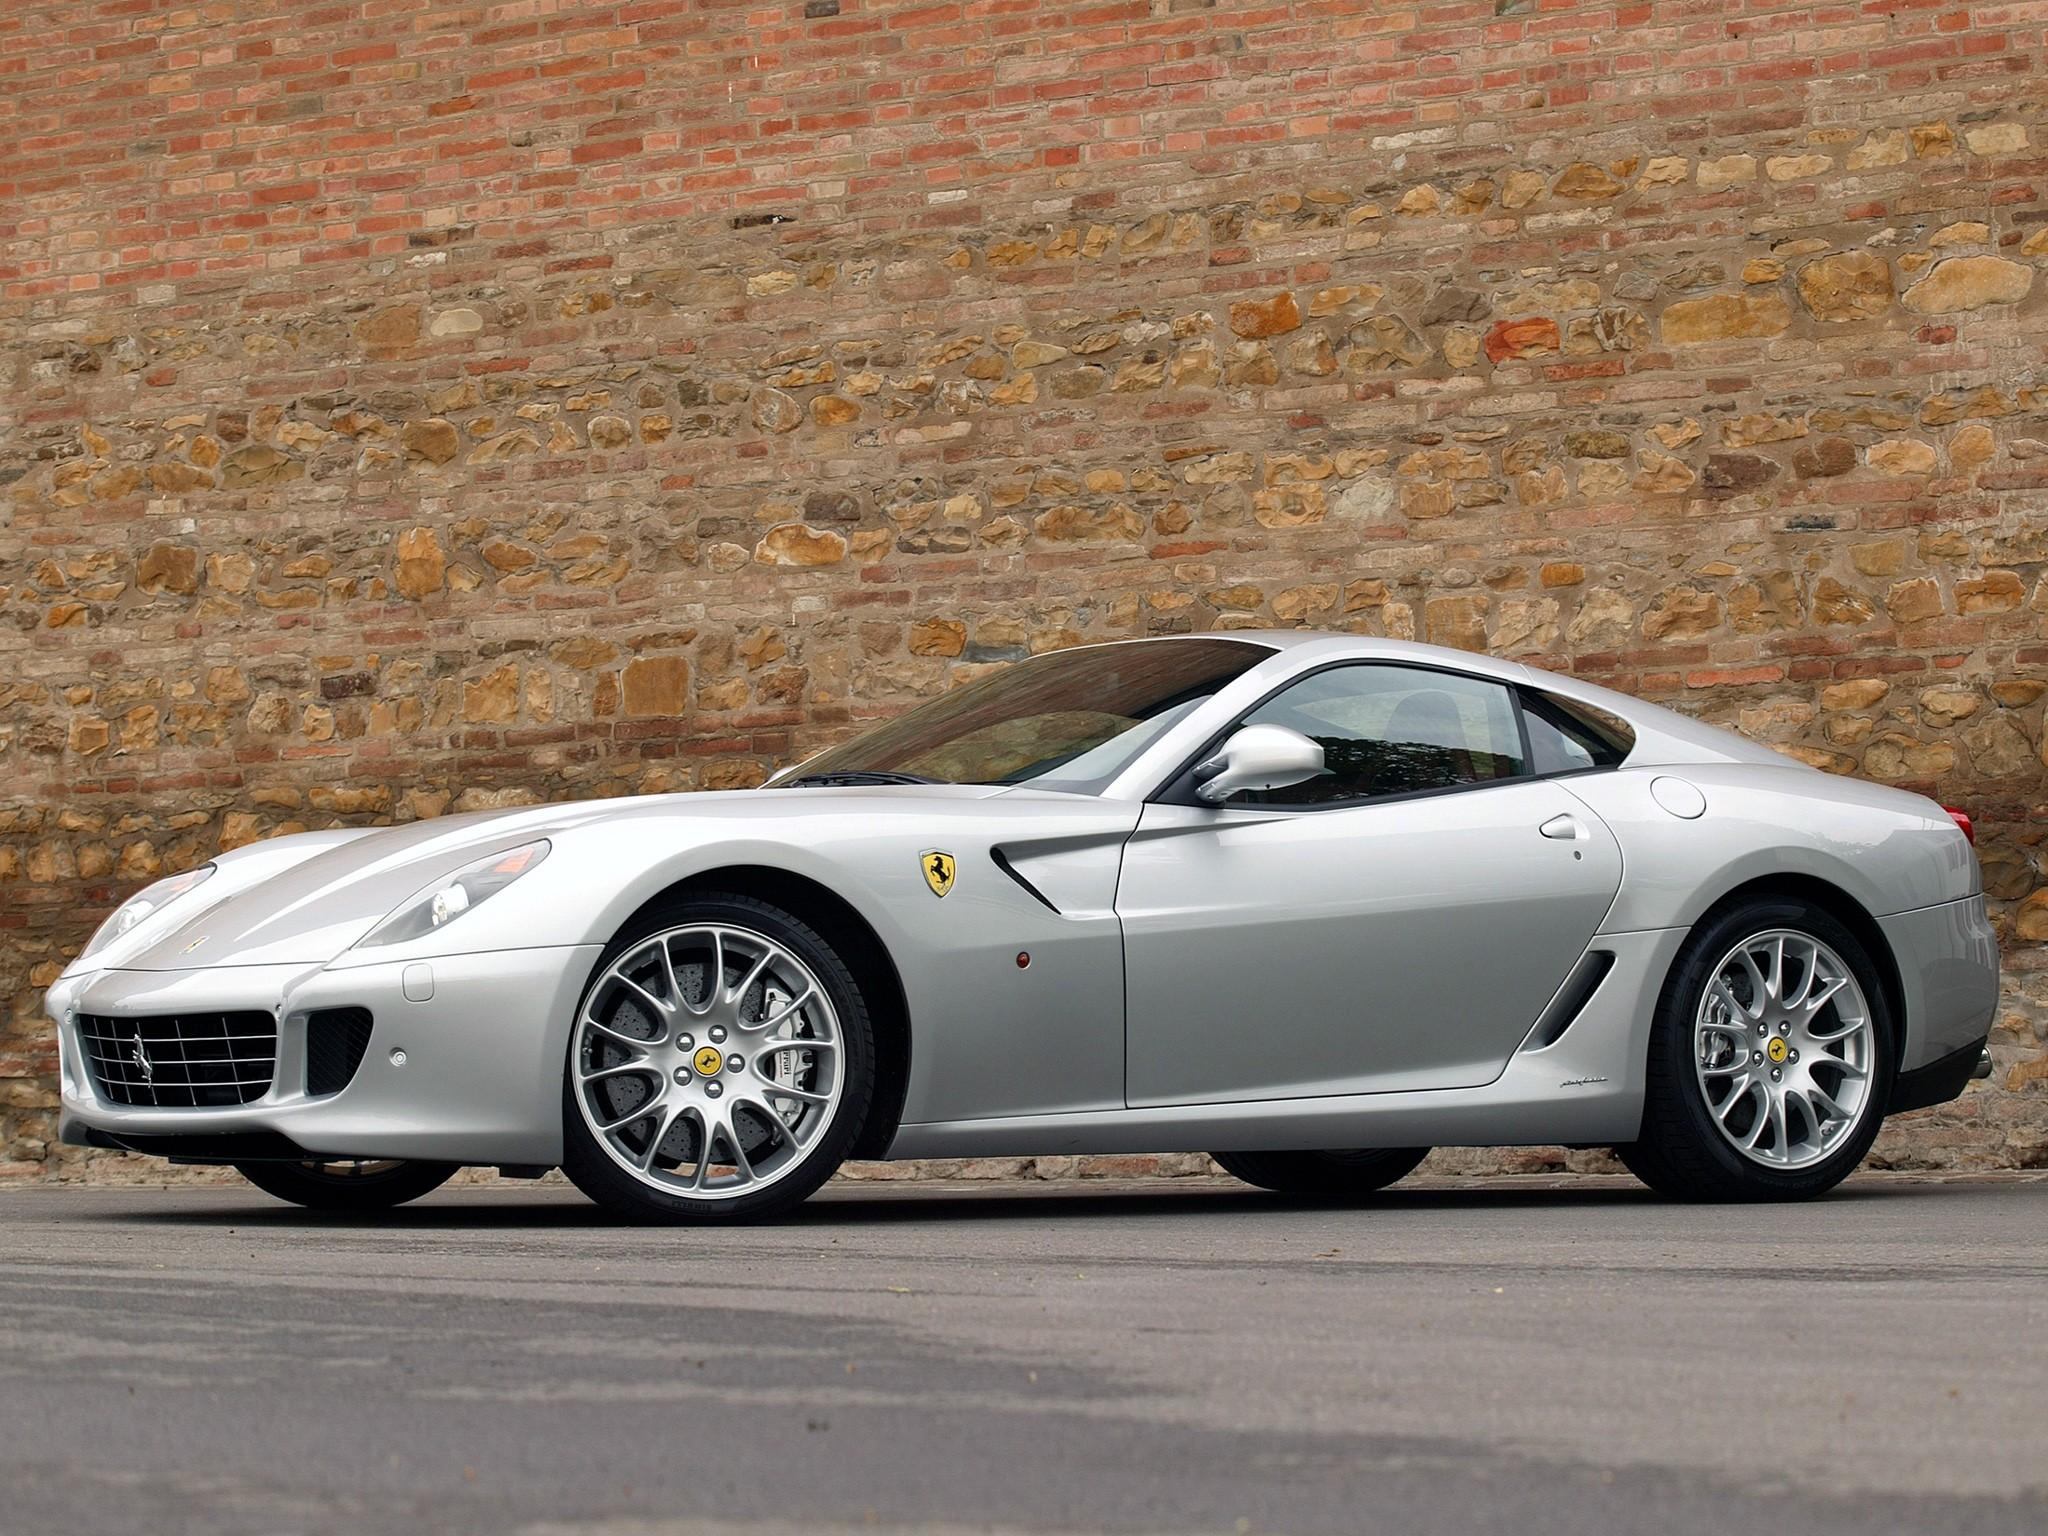 ... FERRARI 599 GTB Fiorano (2006 - 2012) ...